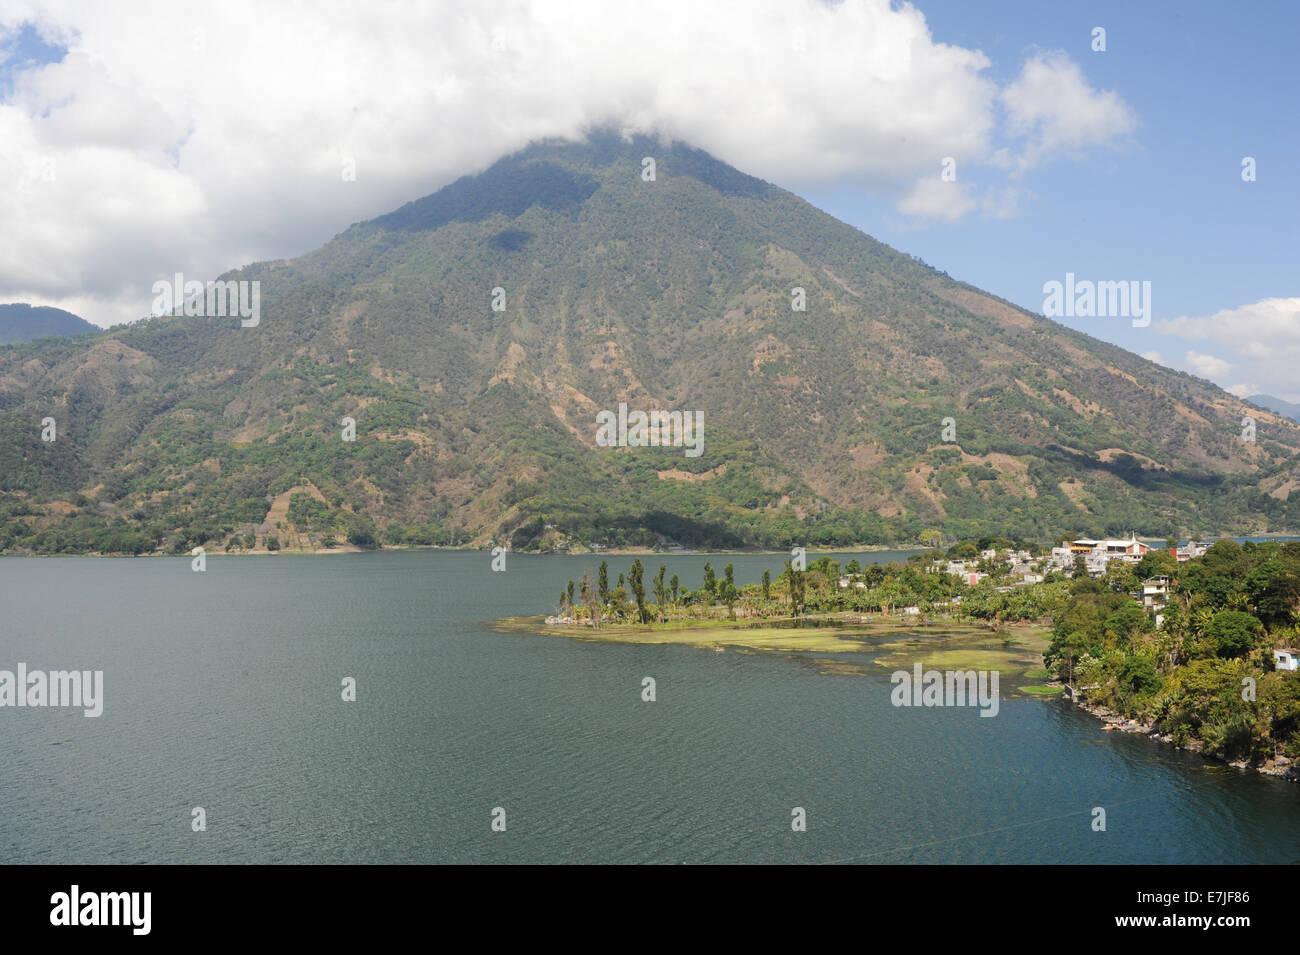 Guatemala, Central America, San Pedro, Atitlan, clouds, lake, nature, Santiago, scenic, trees, volcano - Stock Image